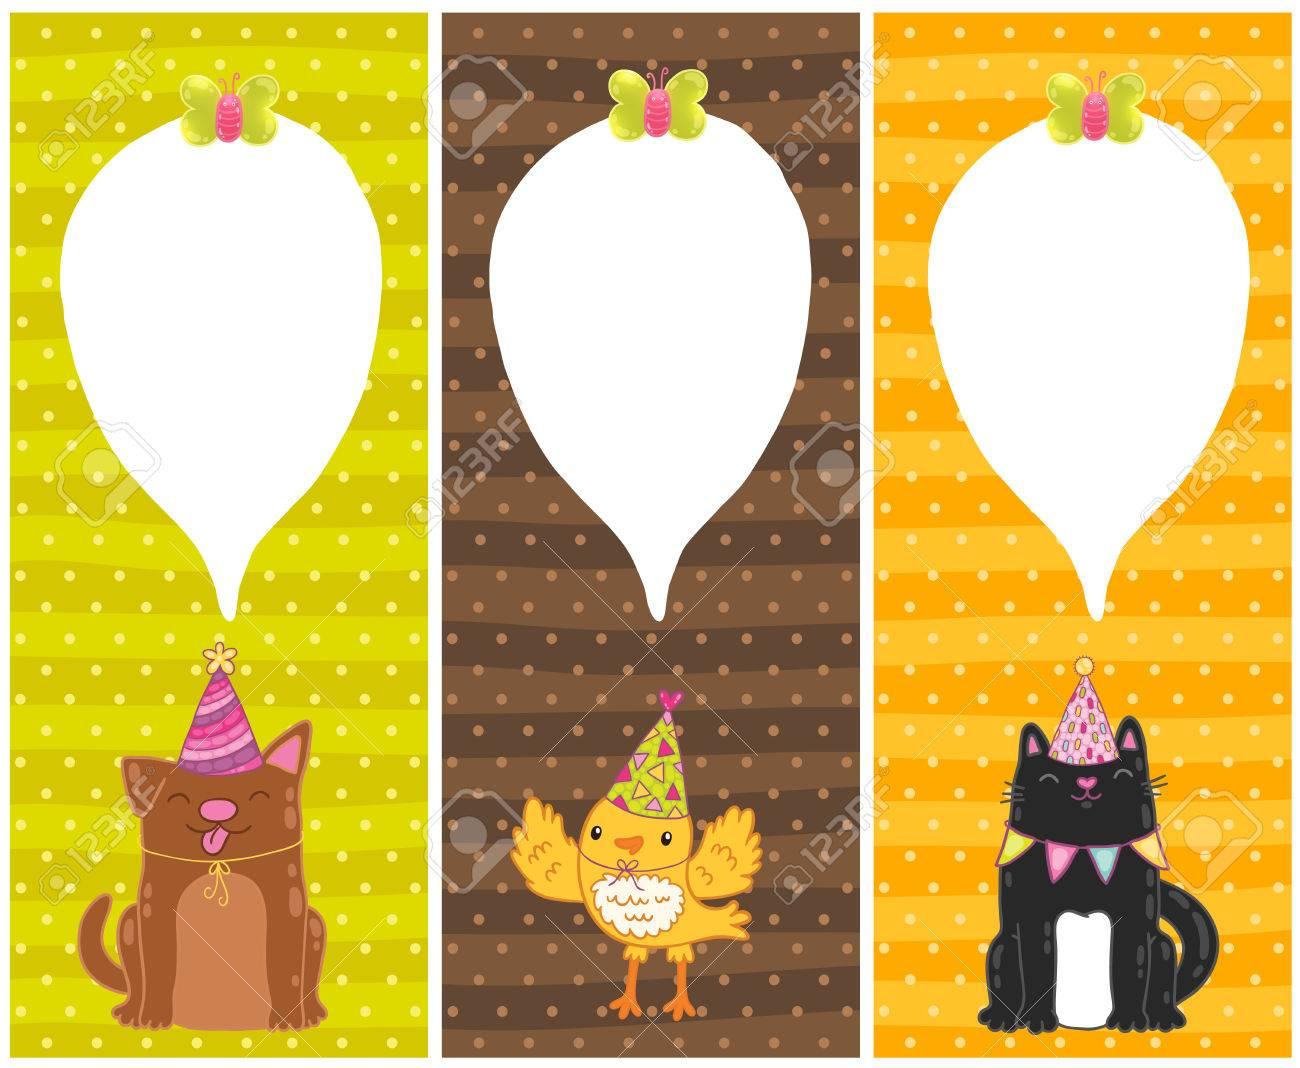 Cute Cartoon Happy Birthday Cards With Dog Cat Bird Stock Vector